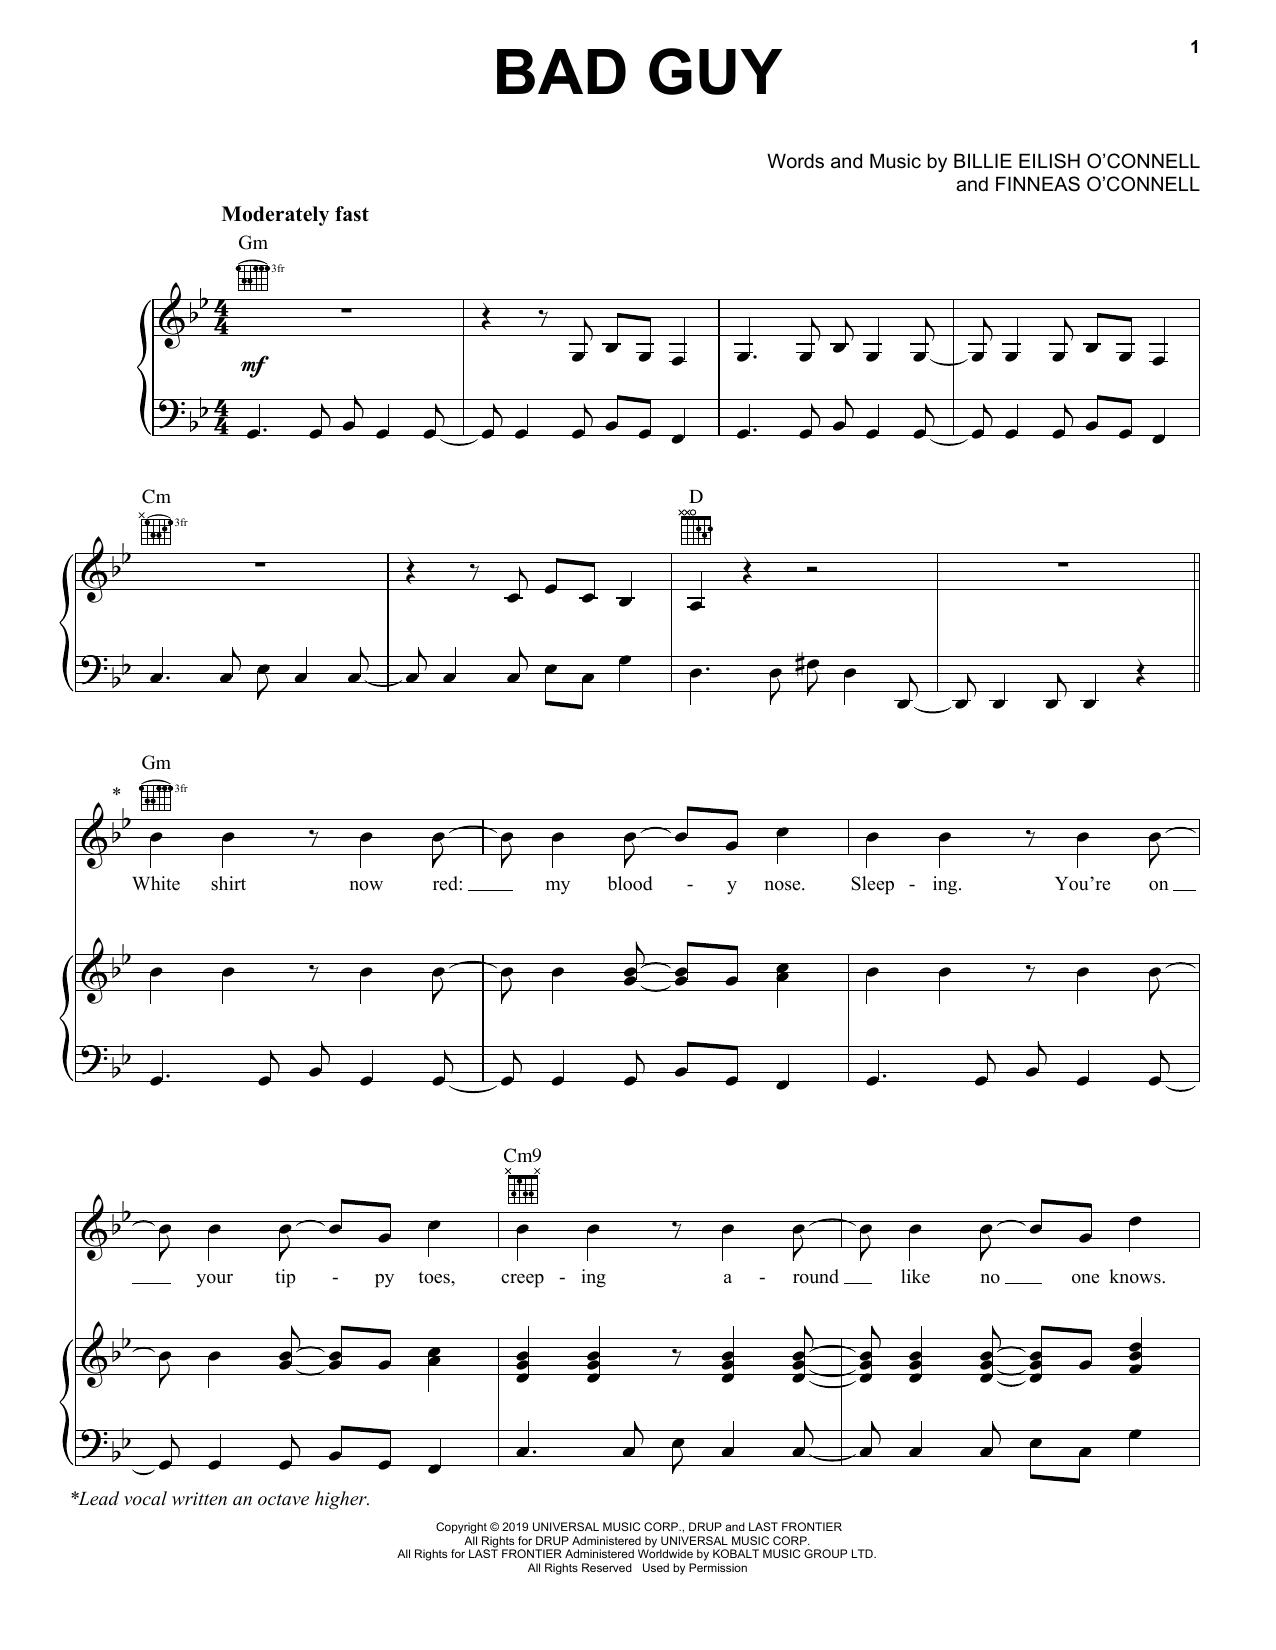 Billie Eilish 'bad Guy' Sheet Music, Notes & Chords In 2019 - Bad Day Piano Sheet Music Free Printable